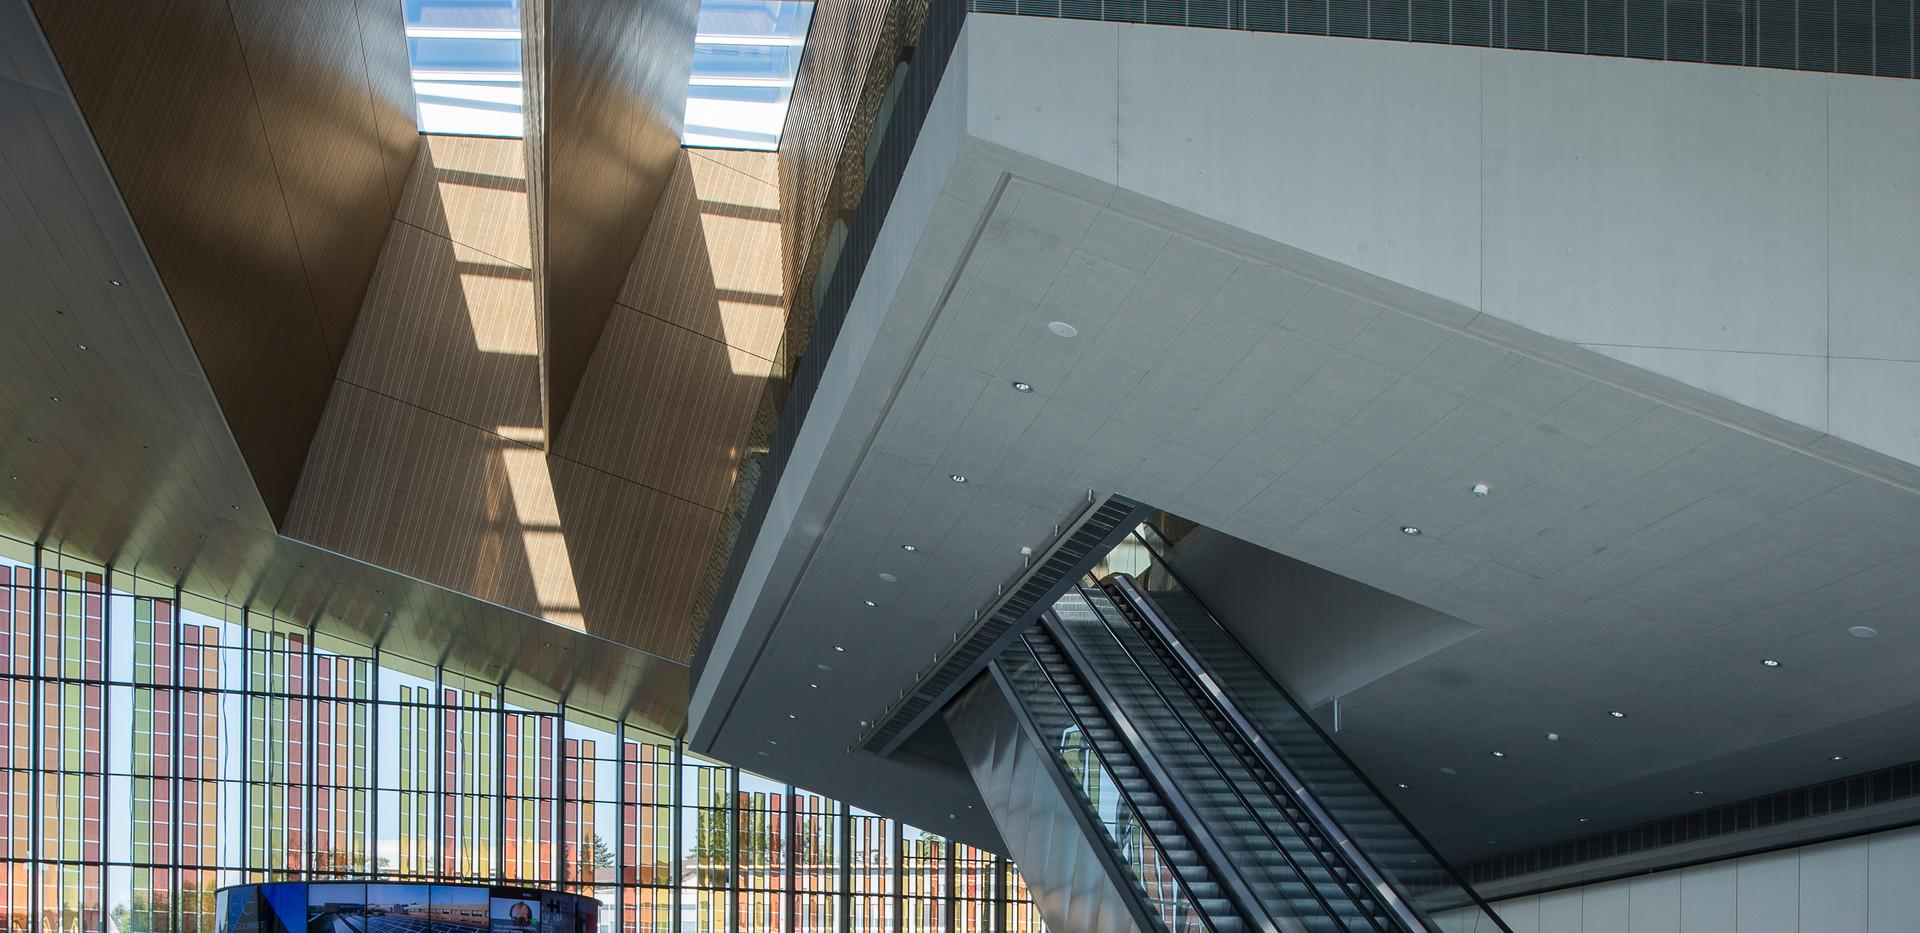 Foyer_Campus1_copyright_Adrien Barakat.j